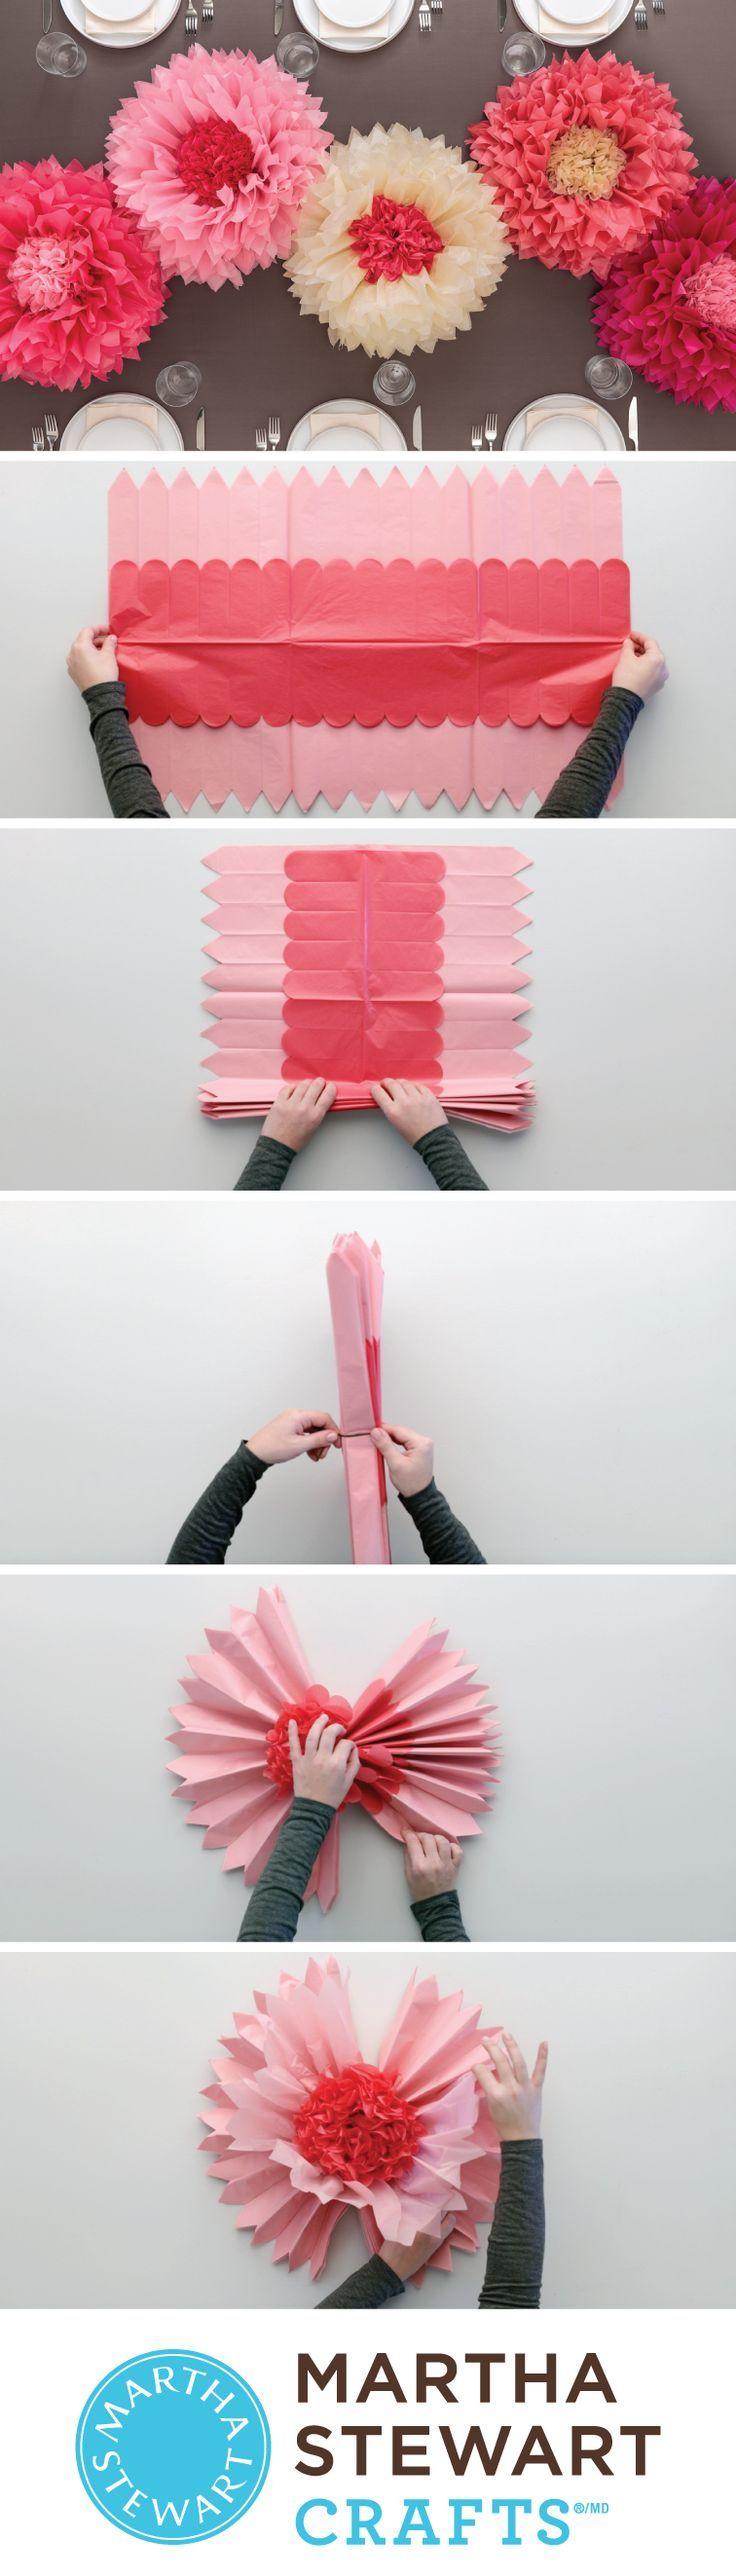 Martha stewart tissue paper pom pom kit create fun festive party martha stewart tissue paper pom pom kit create fun festive party decorations with mightylinksfo Image collections